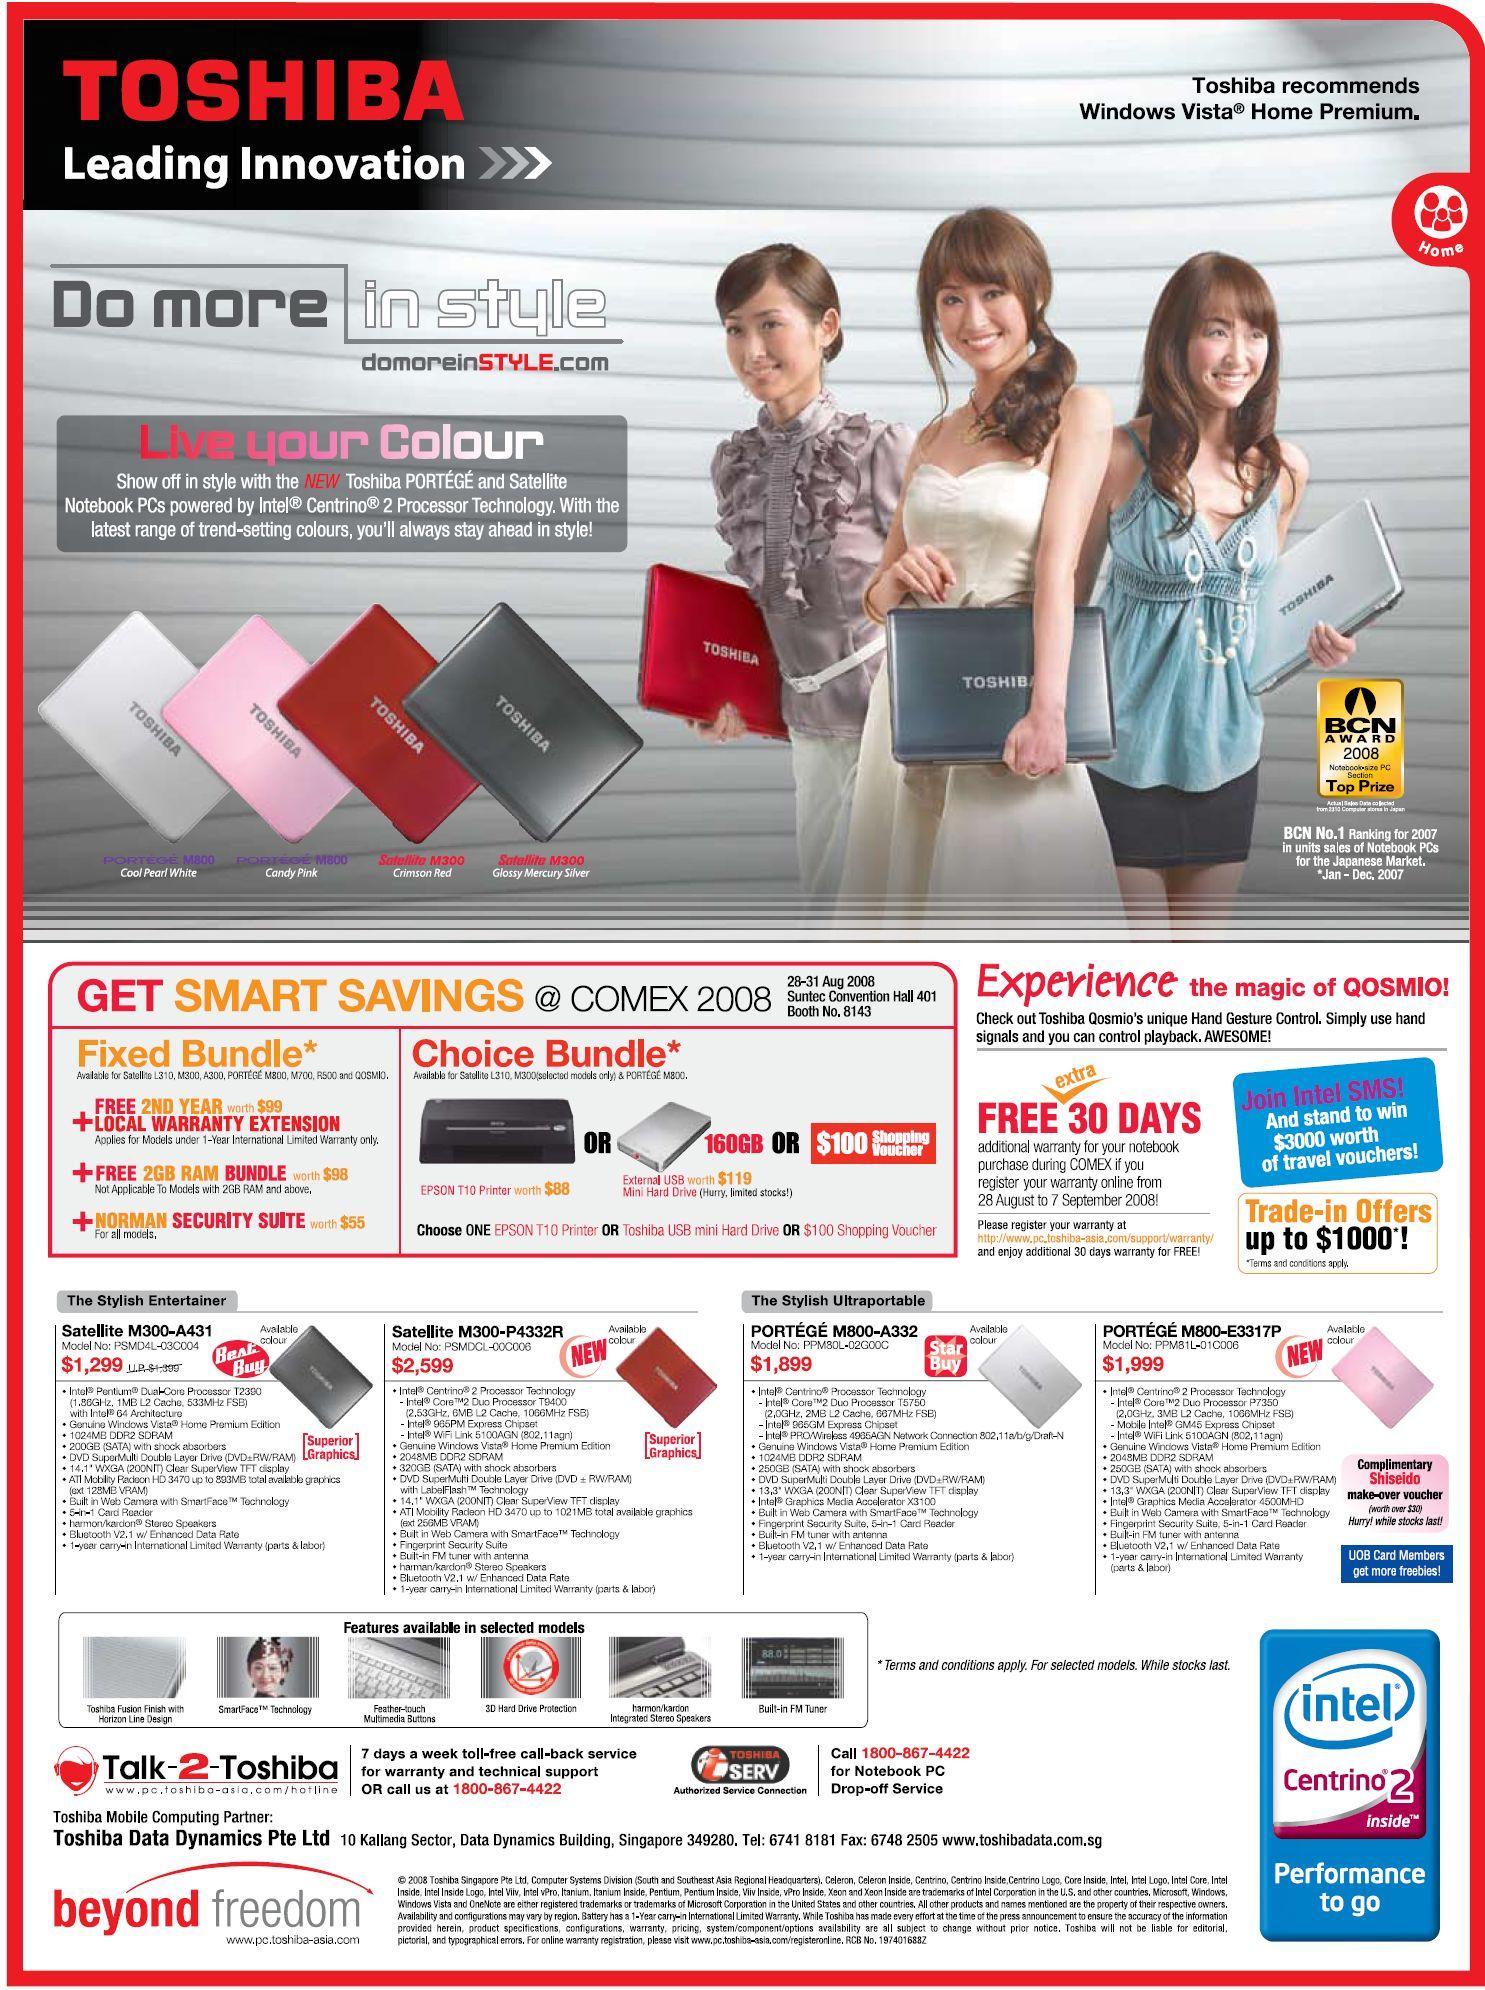 Comex 2008 price list image brochure of Toshiba Laptops